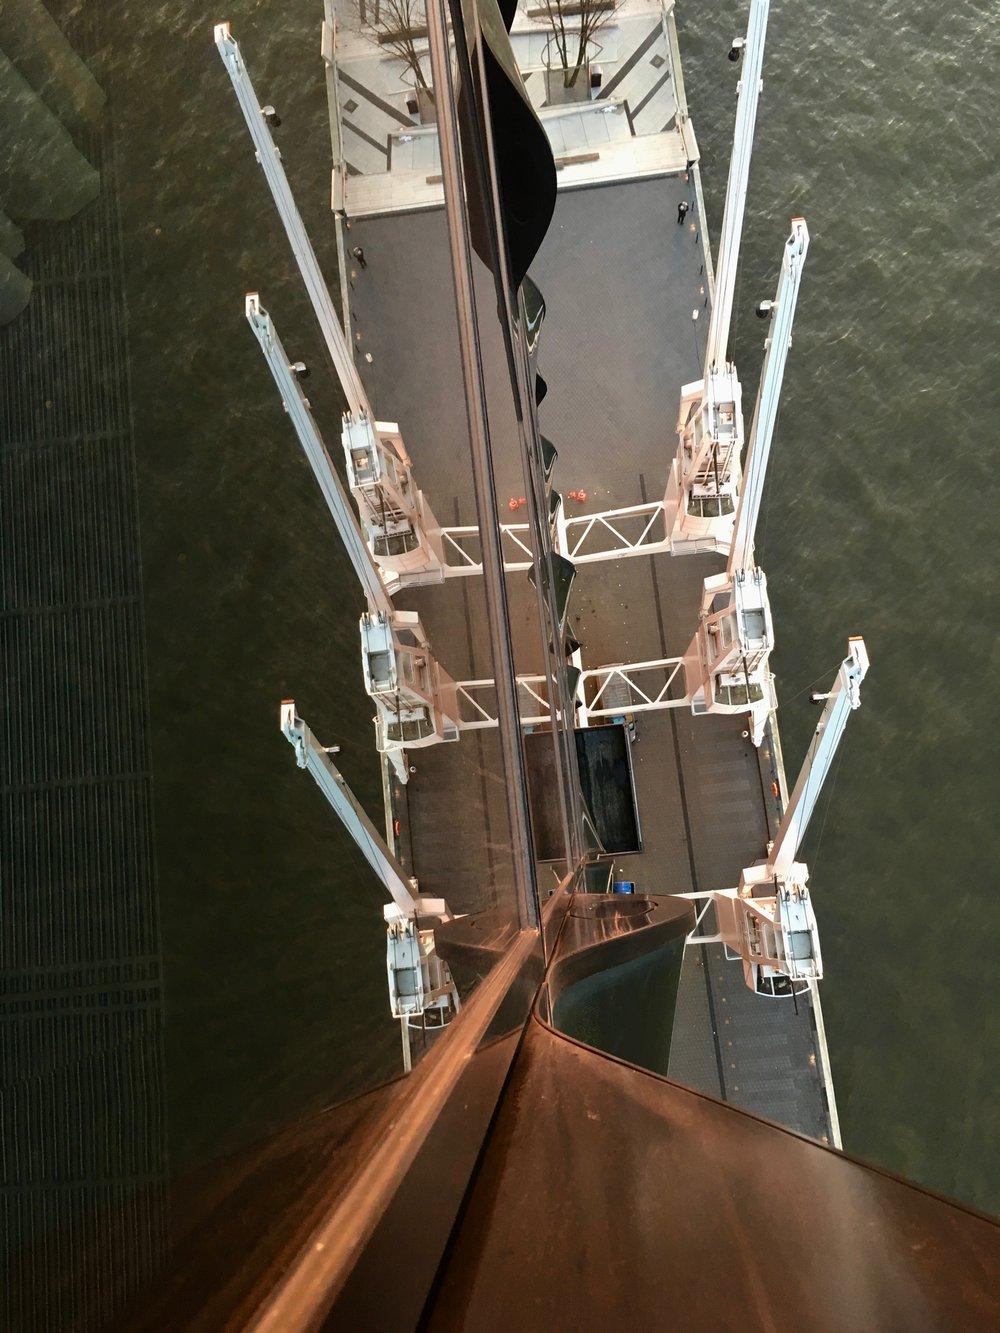 Elbphilharmonie Hamburg The Westin Hotel Reiseblog BeFifty